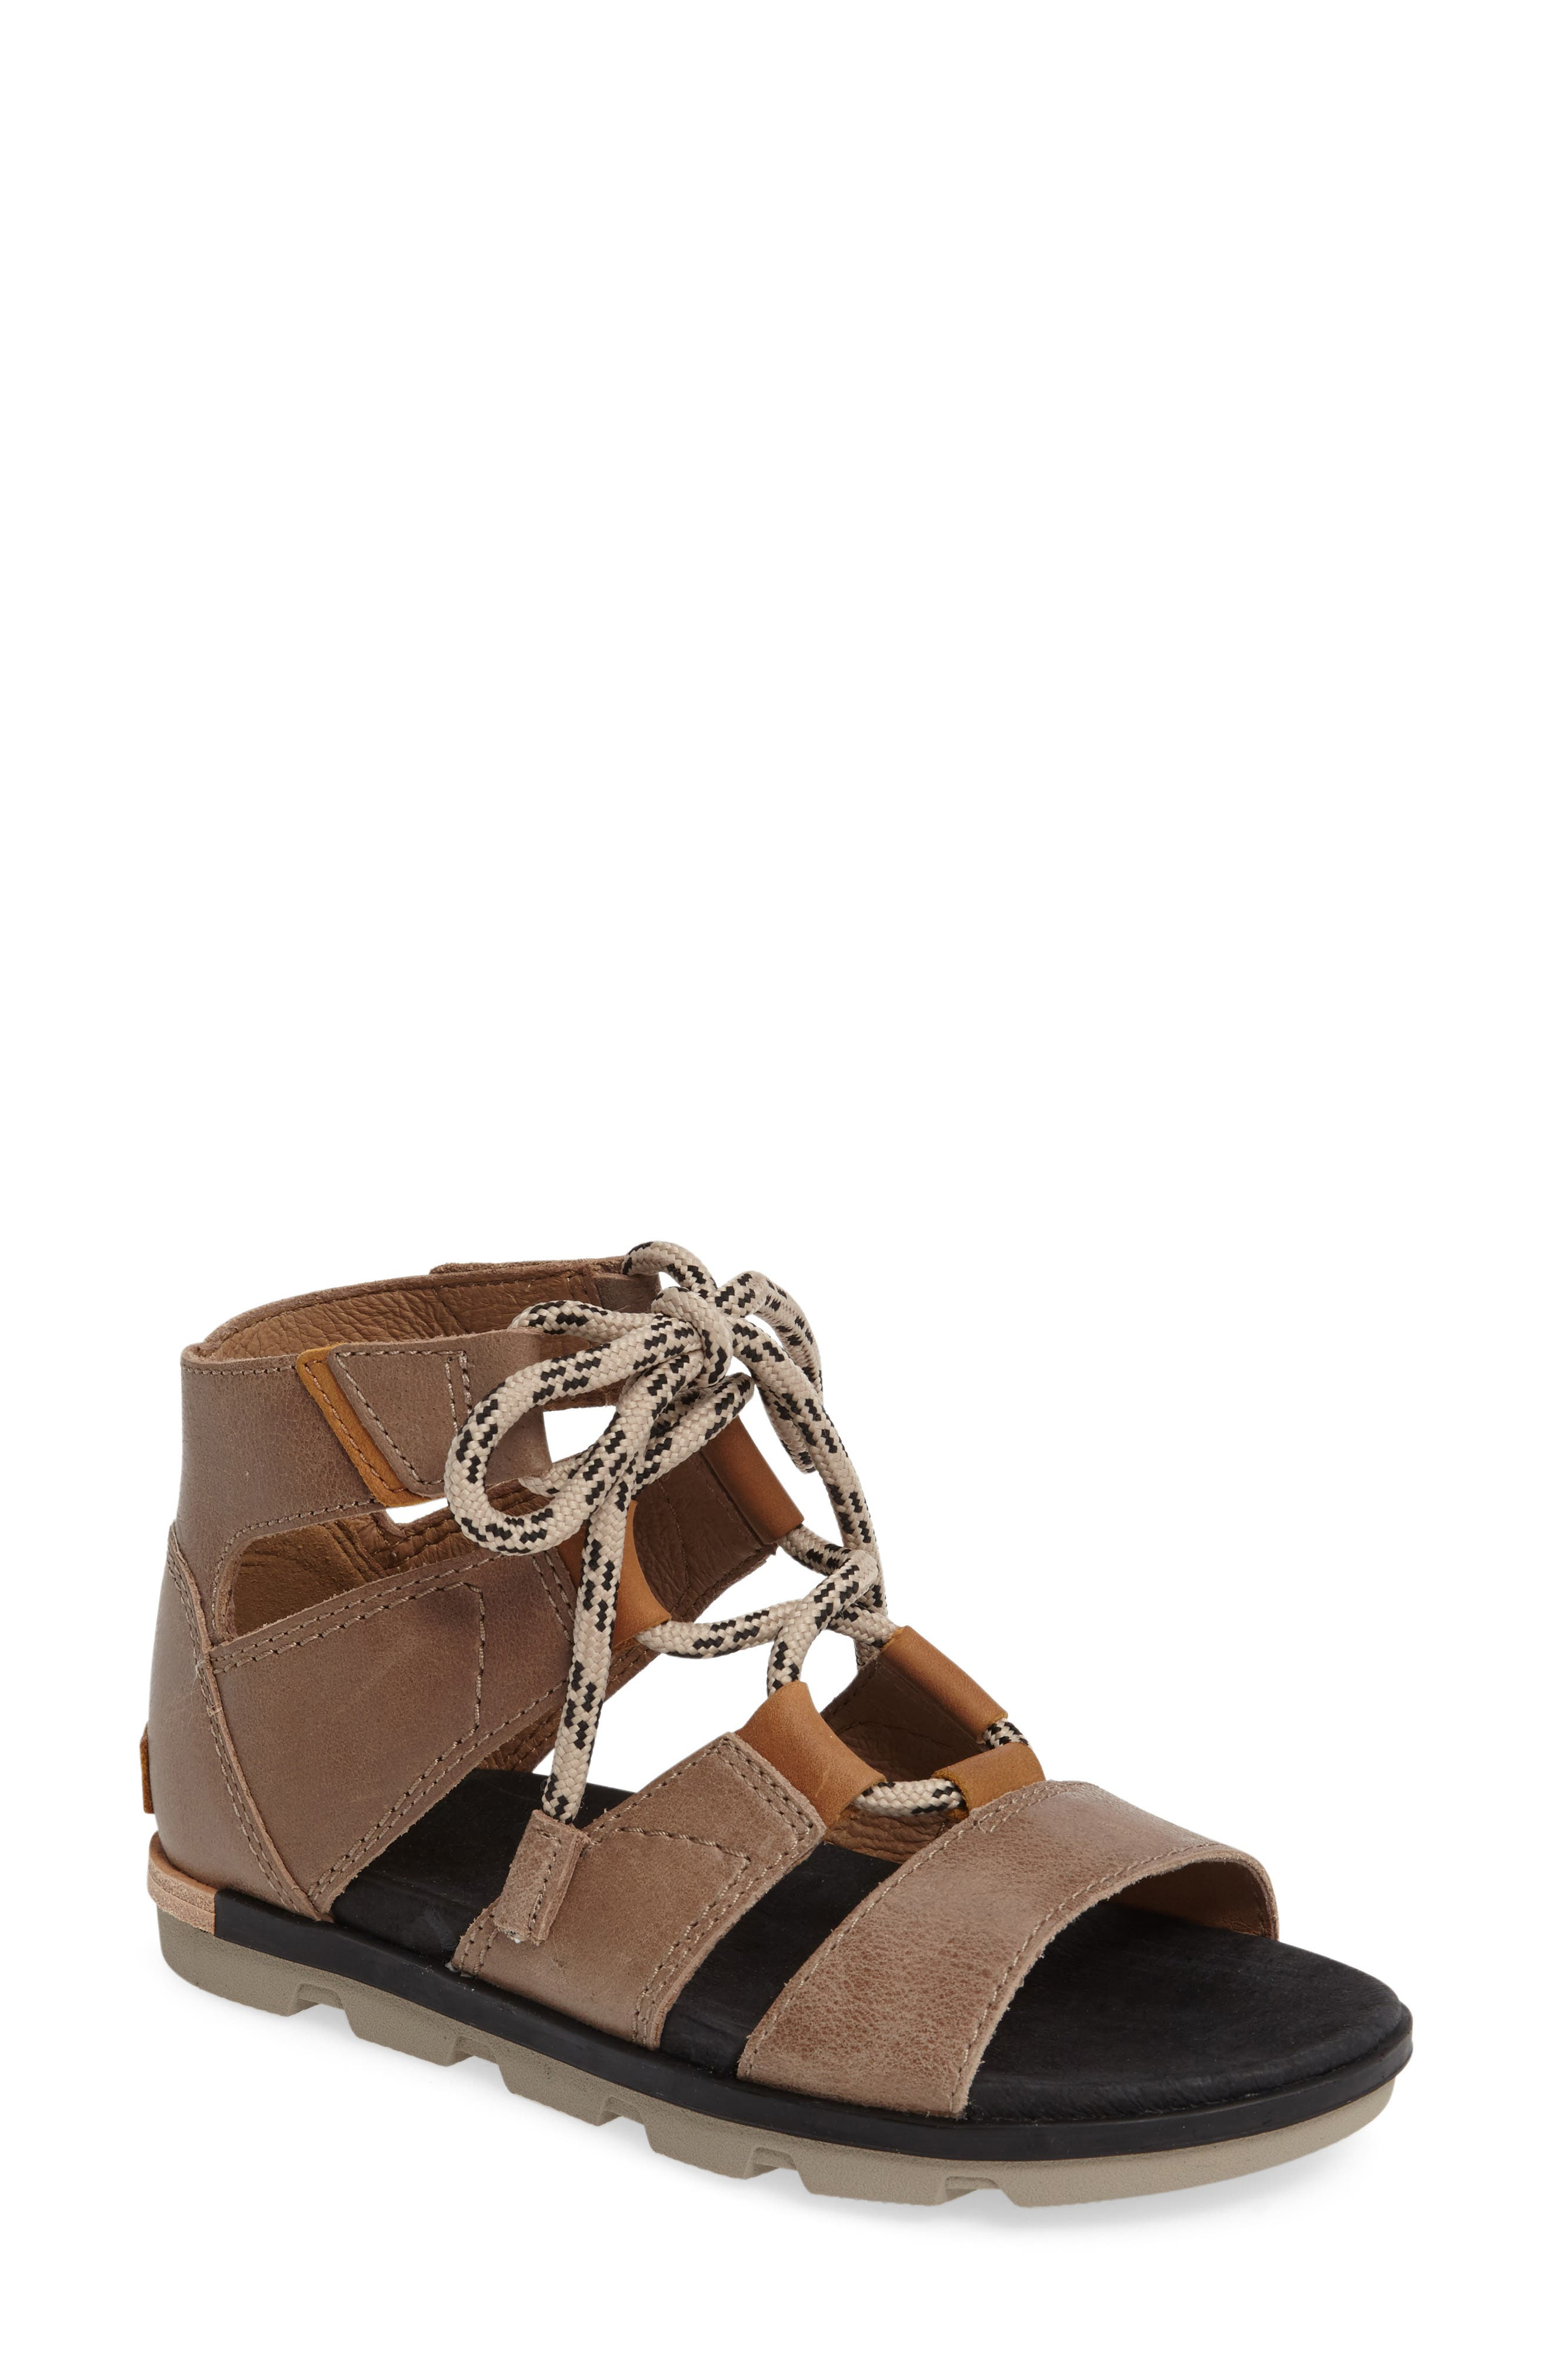 Main Image - SOREL 'Torpeda' Lace-Up Sandal (Women)